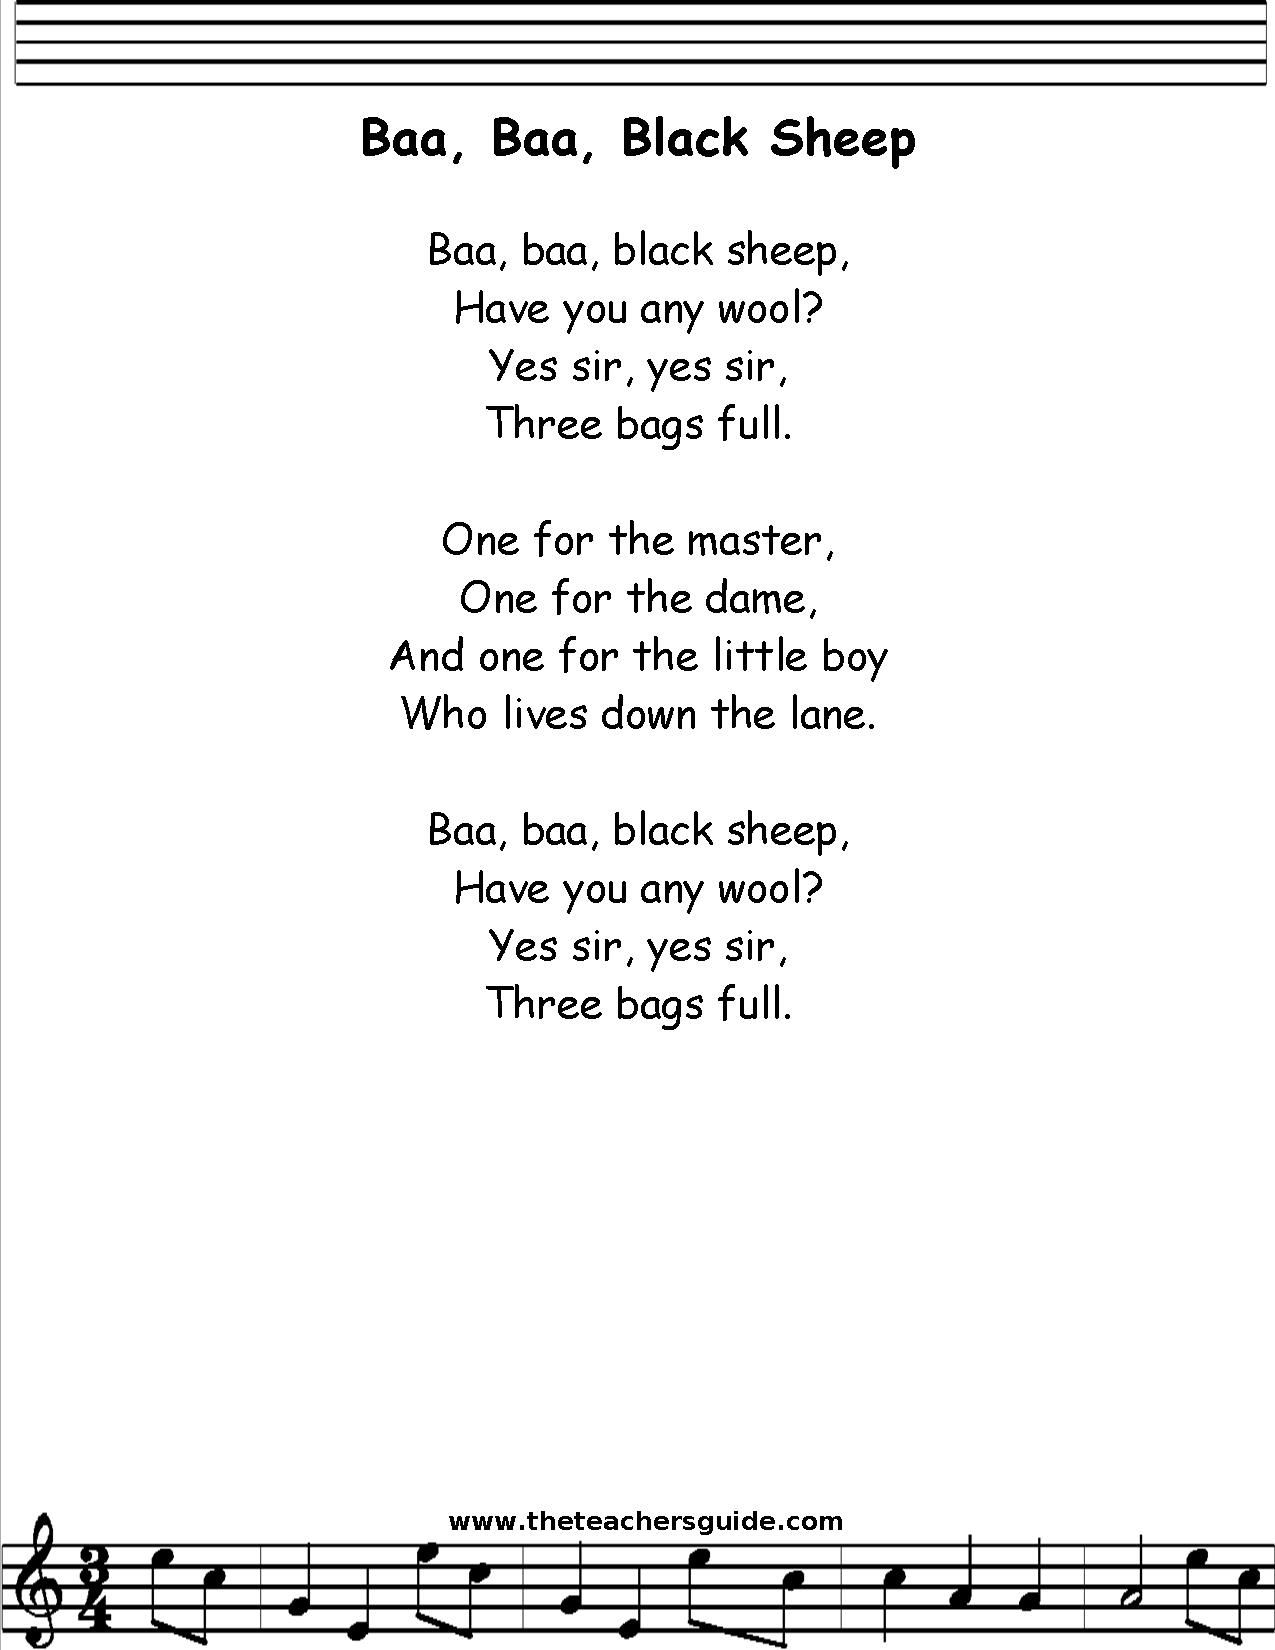 Baa Baa Black Sheep Lyrics Printout